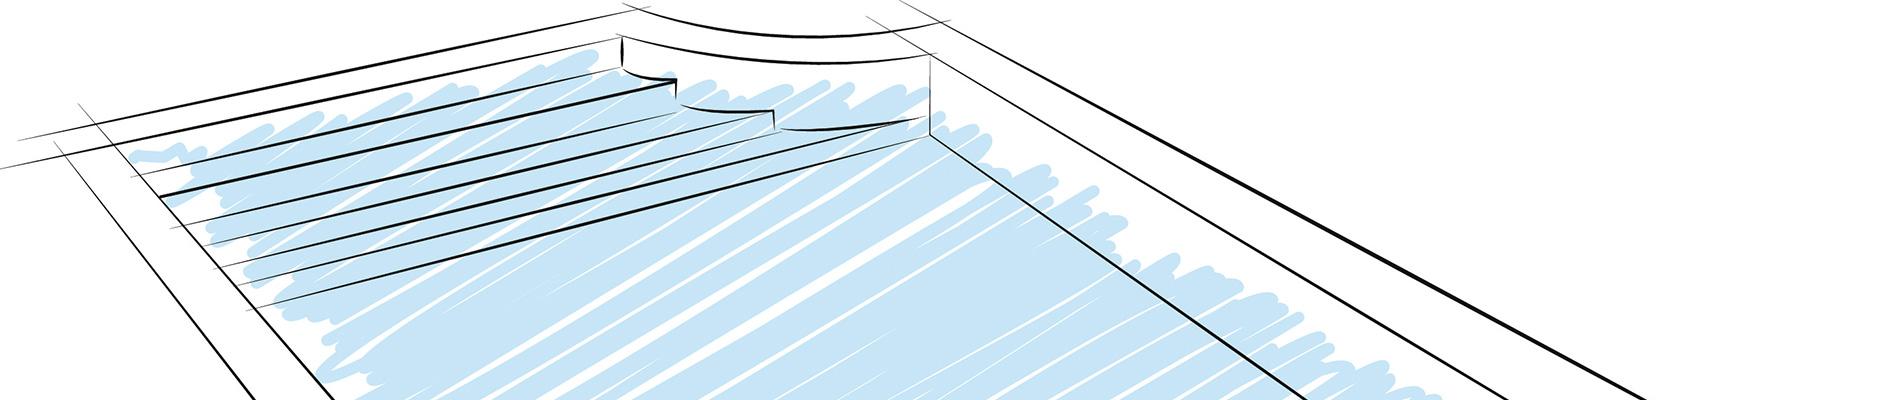 Manoir la piscine design piscines dugain troyes for Piscines dugain